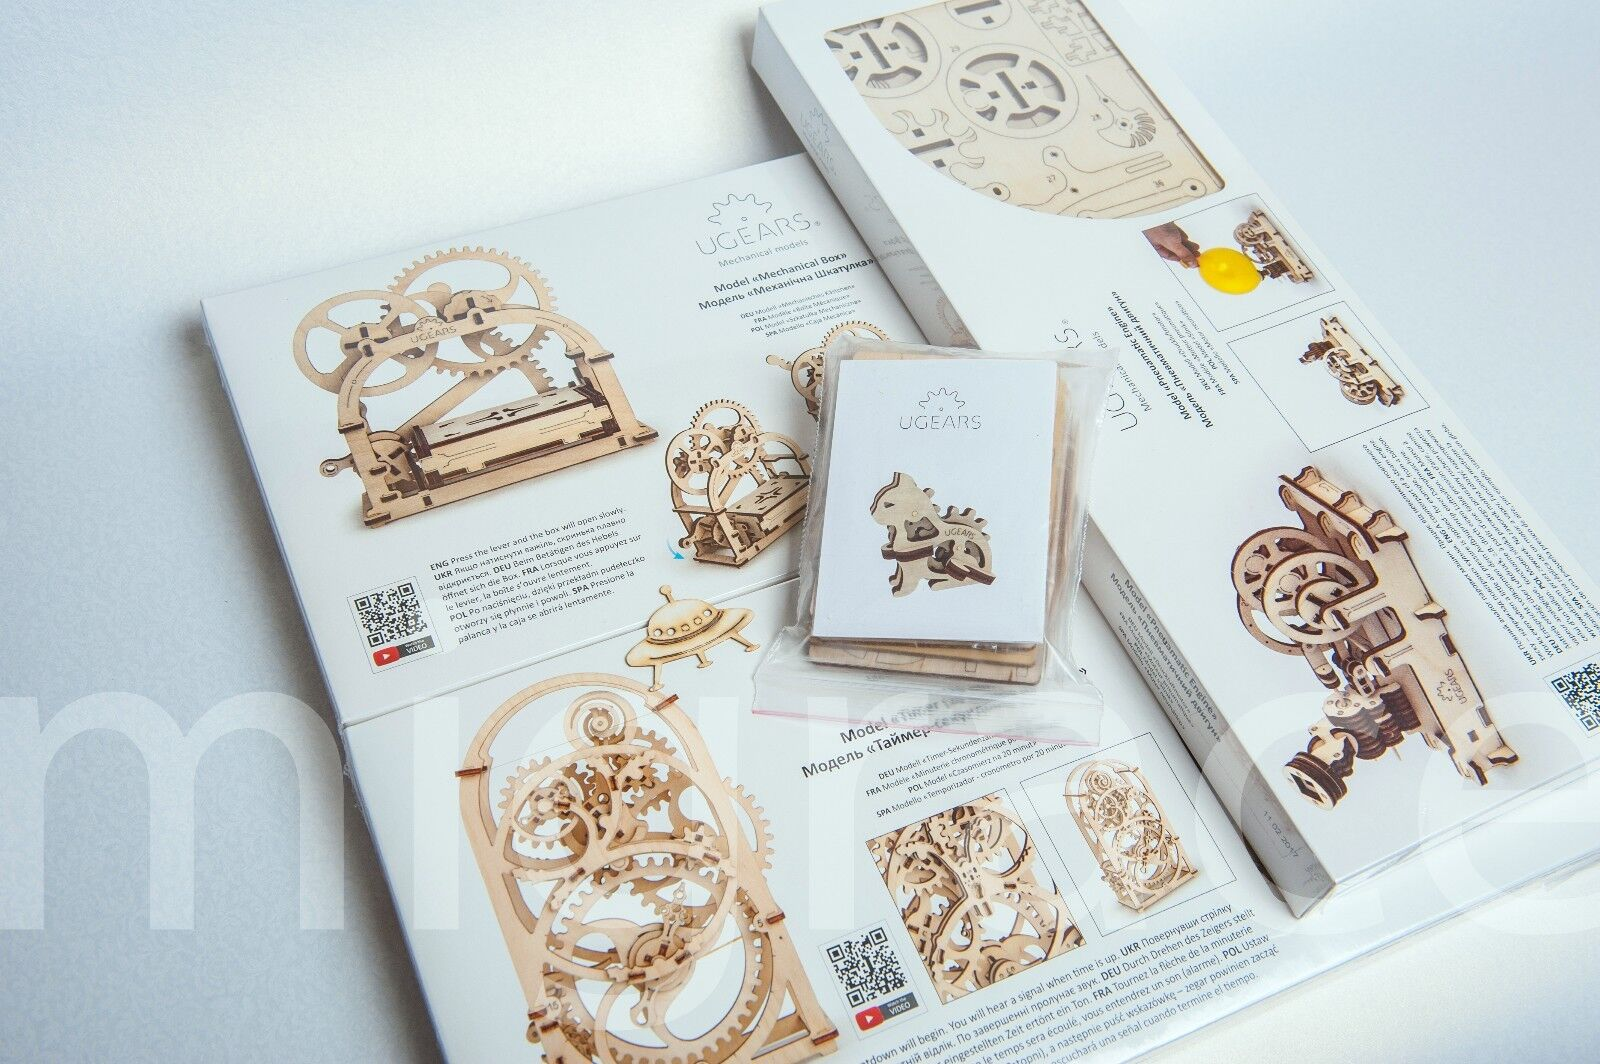 UGears BUNDLE 3 MODELS 3D puzzle ENGINE, TIMER, MECHANICAL BOX + BONUS